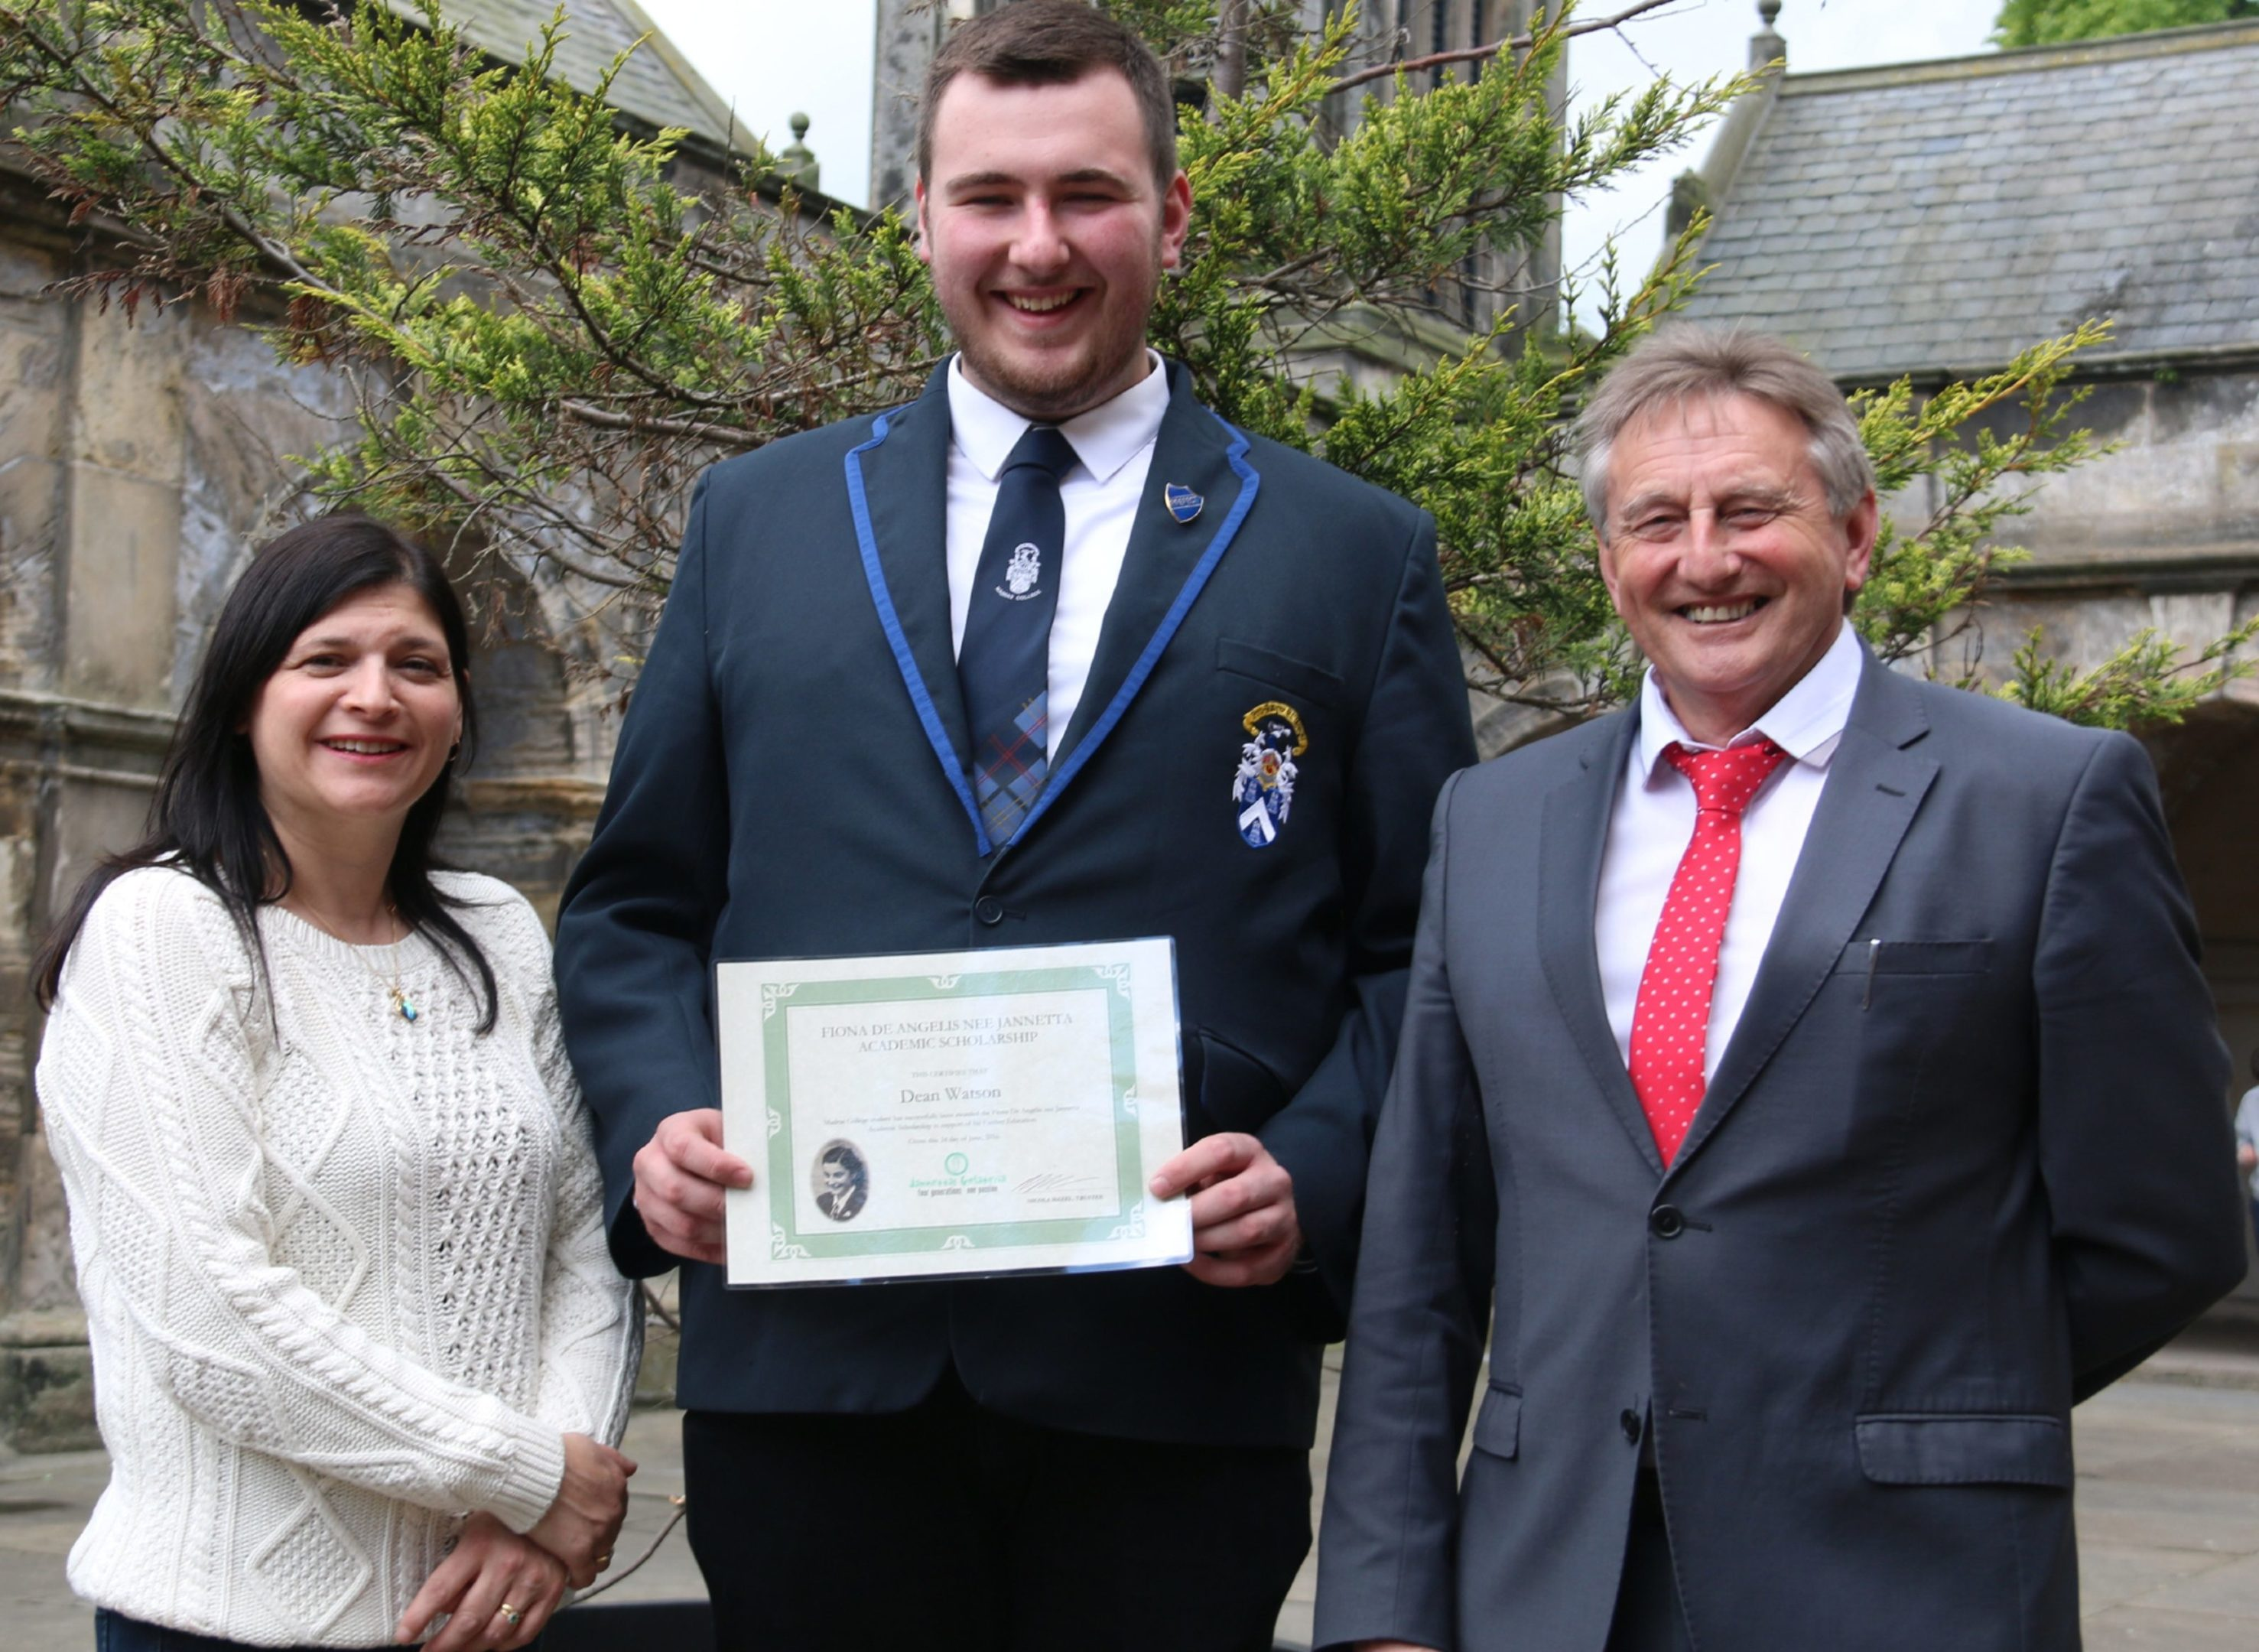 Dean Watson receiving the scholarship certificate from Nicola Hazel, in the presence of Madras Rector David McClure.